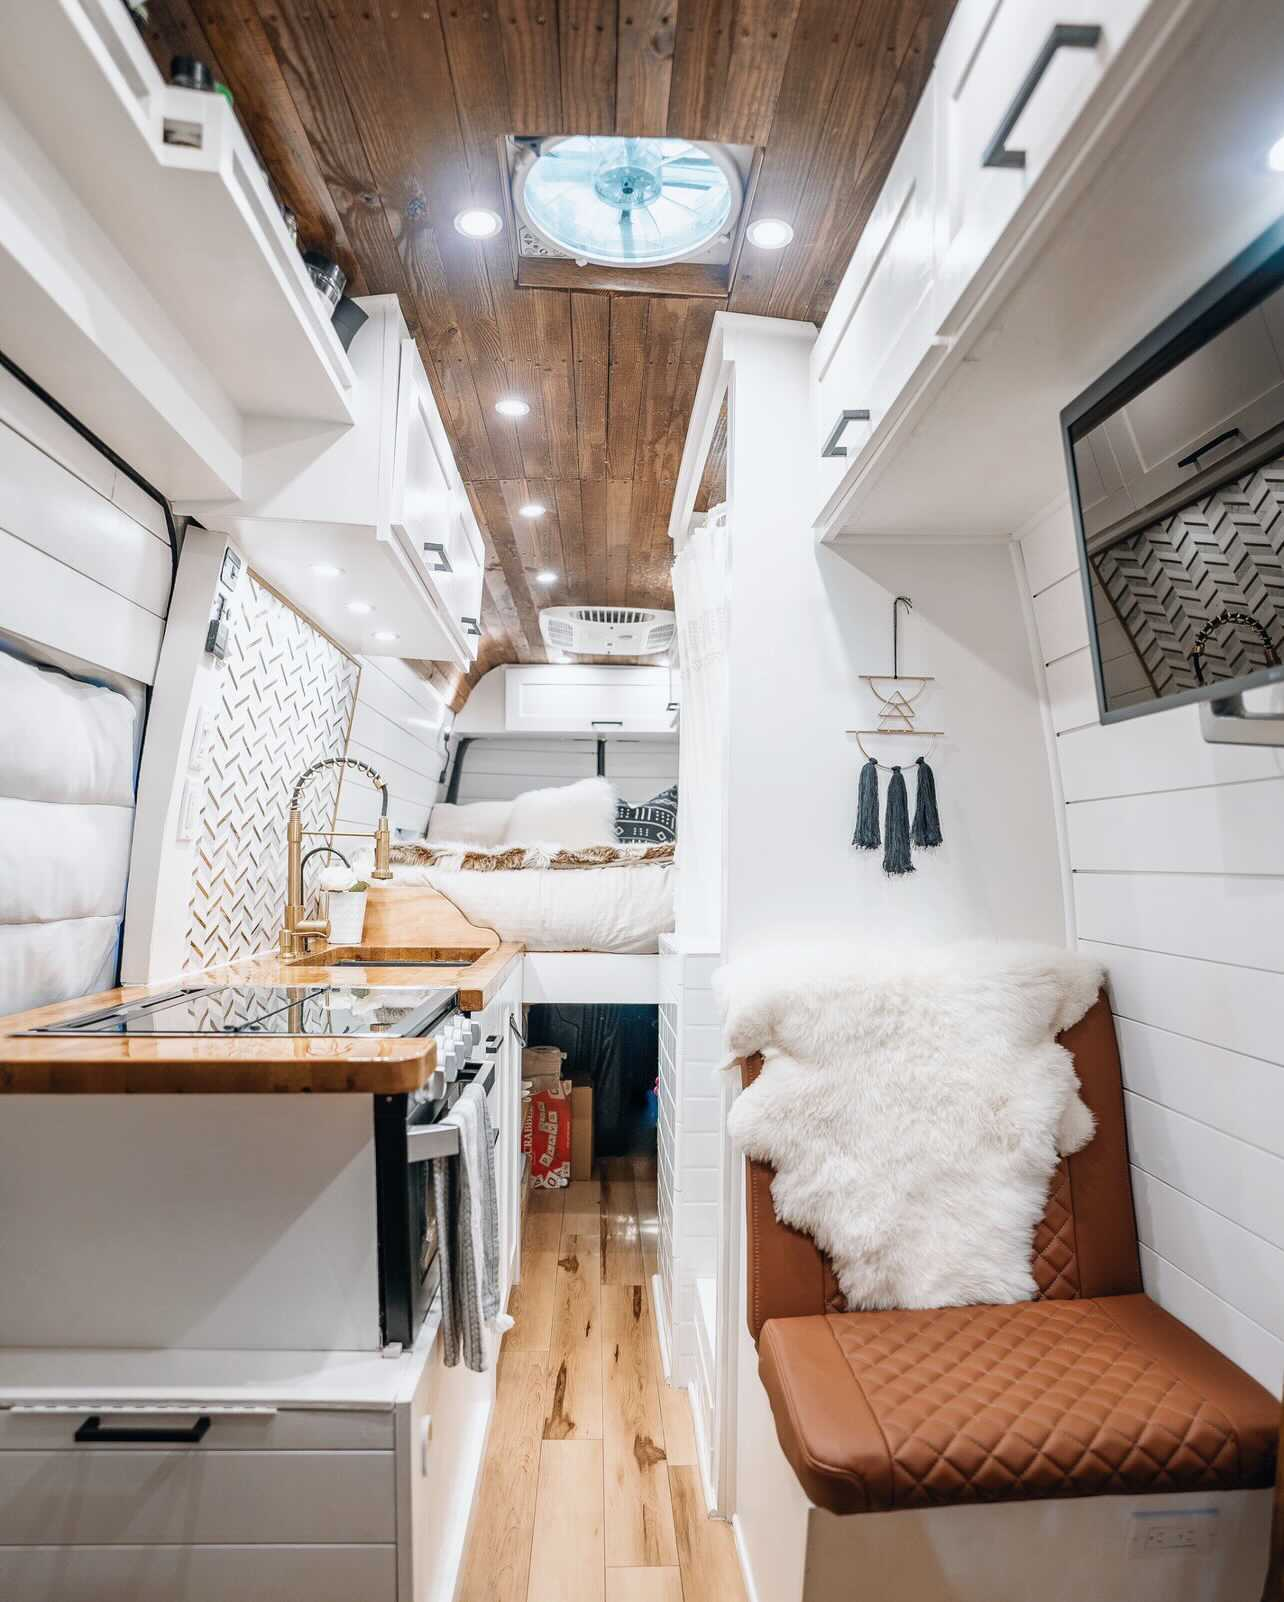 Full Sized Shower In a Camper Van